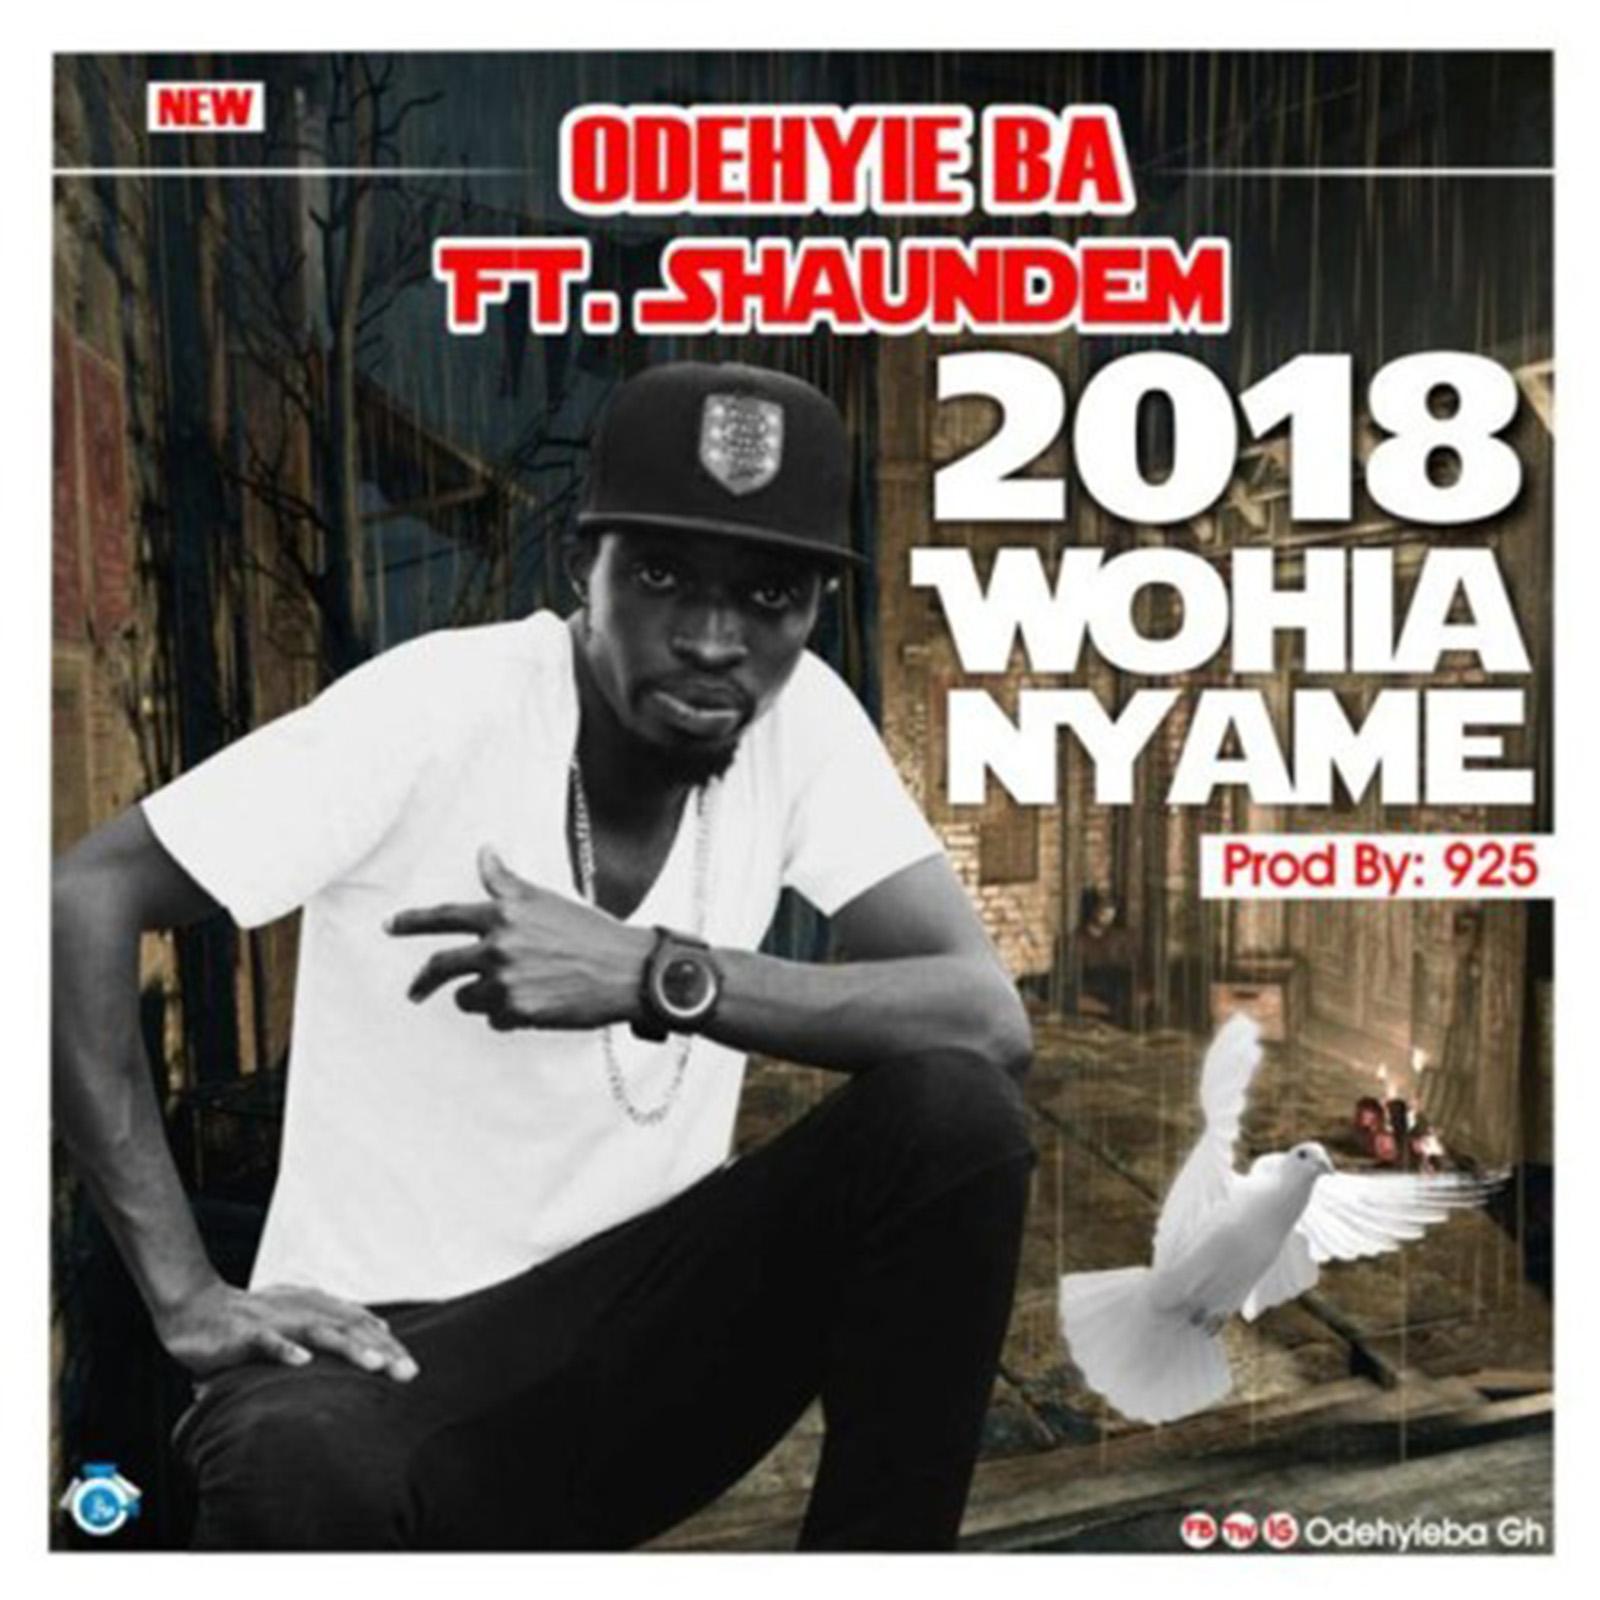 Wohia Nyame by Odehyie Ba feat. Shaundem